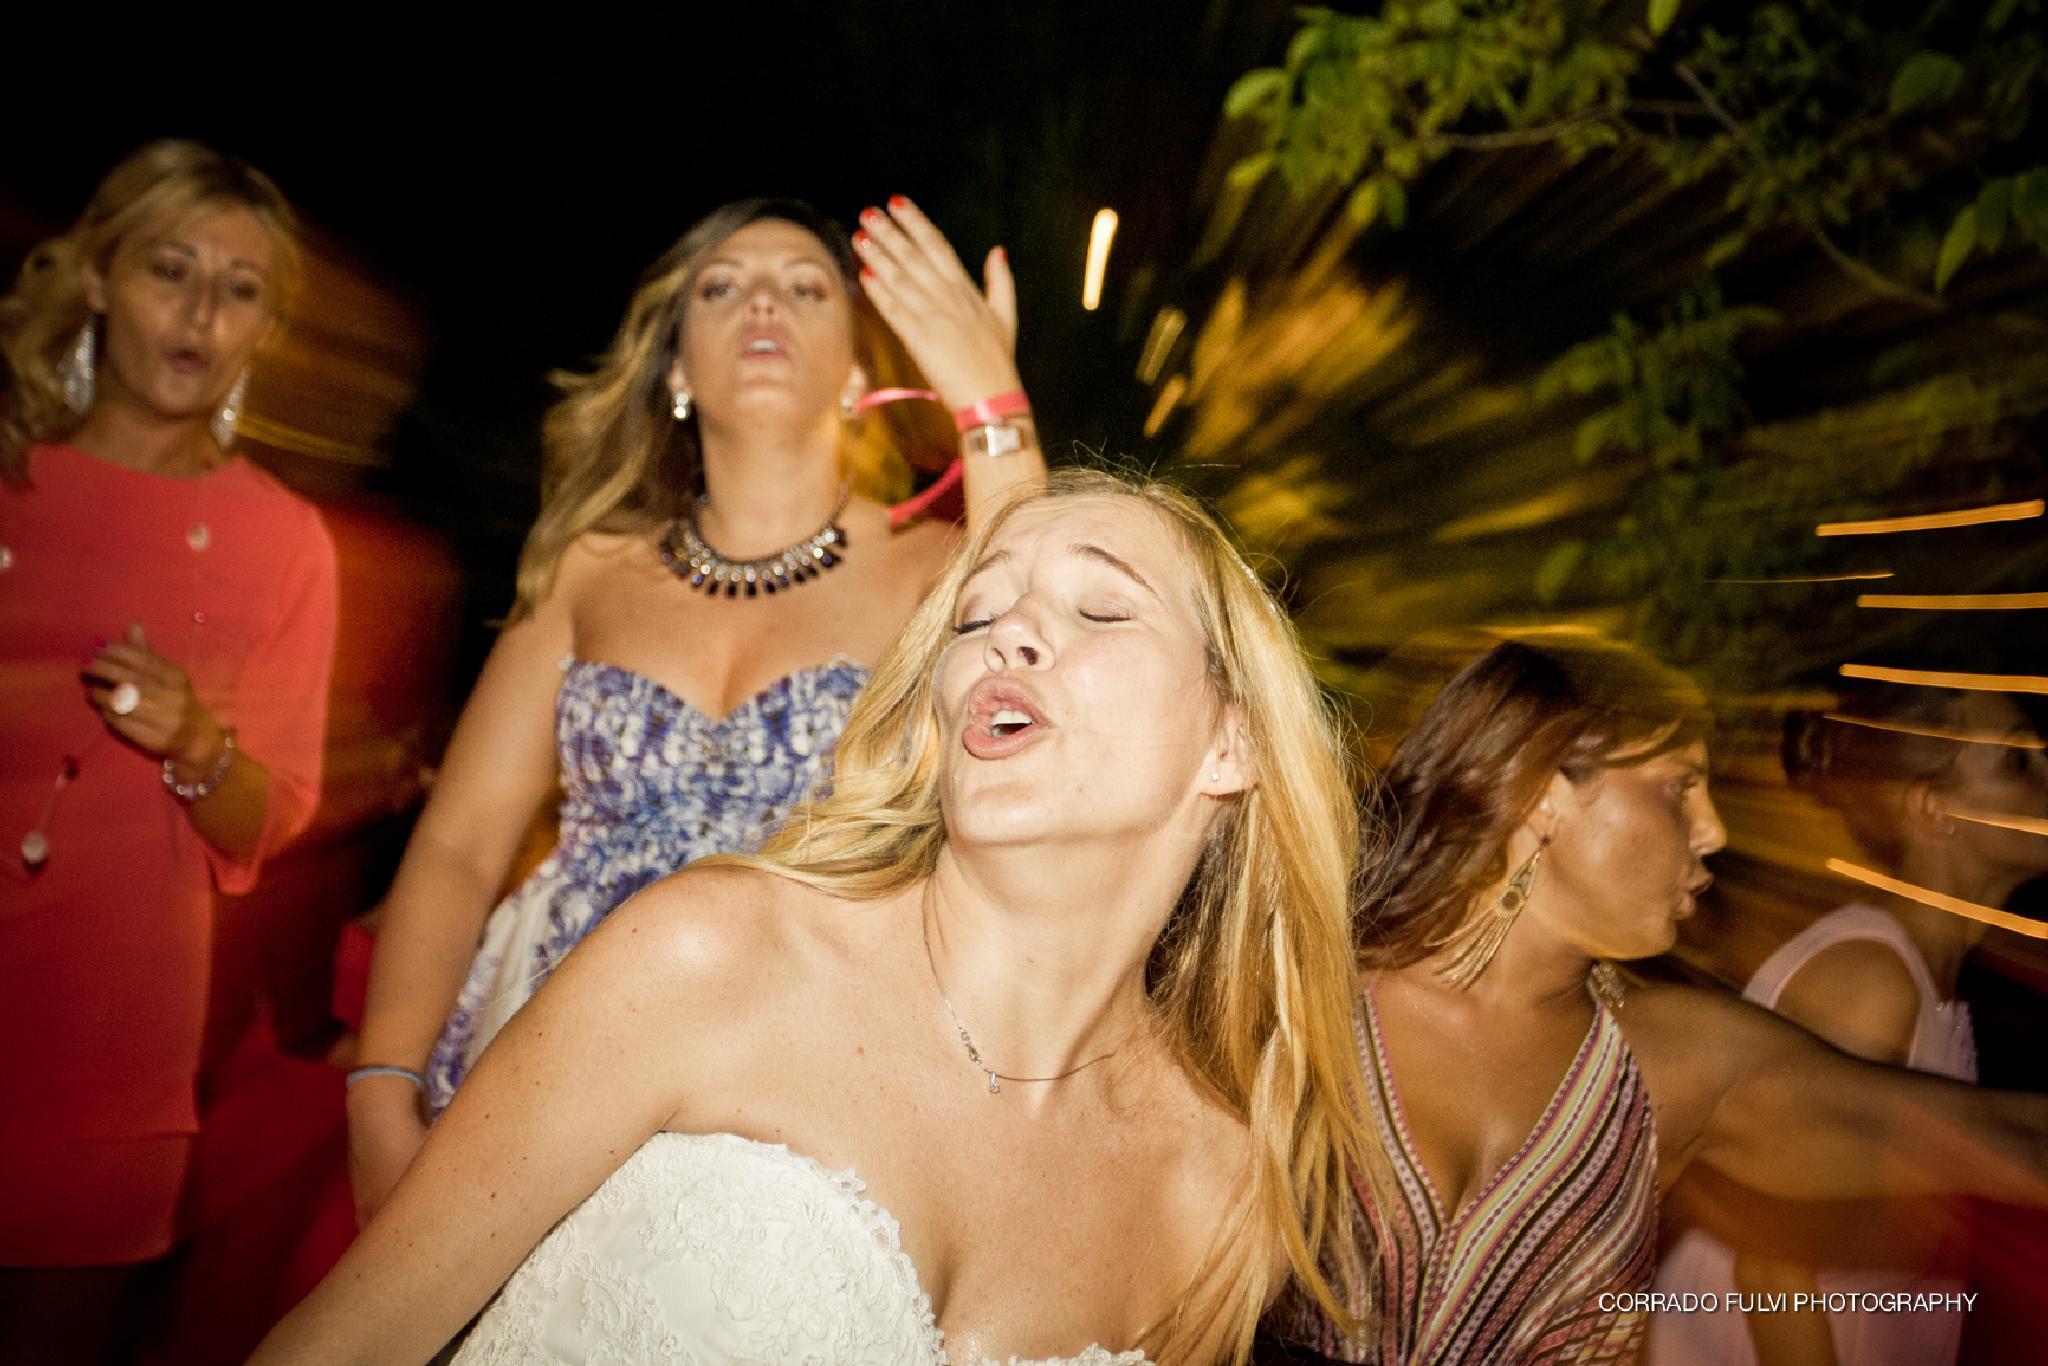 let's dance by CorradoFulvi